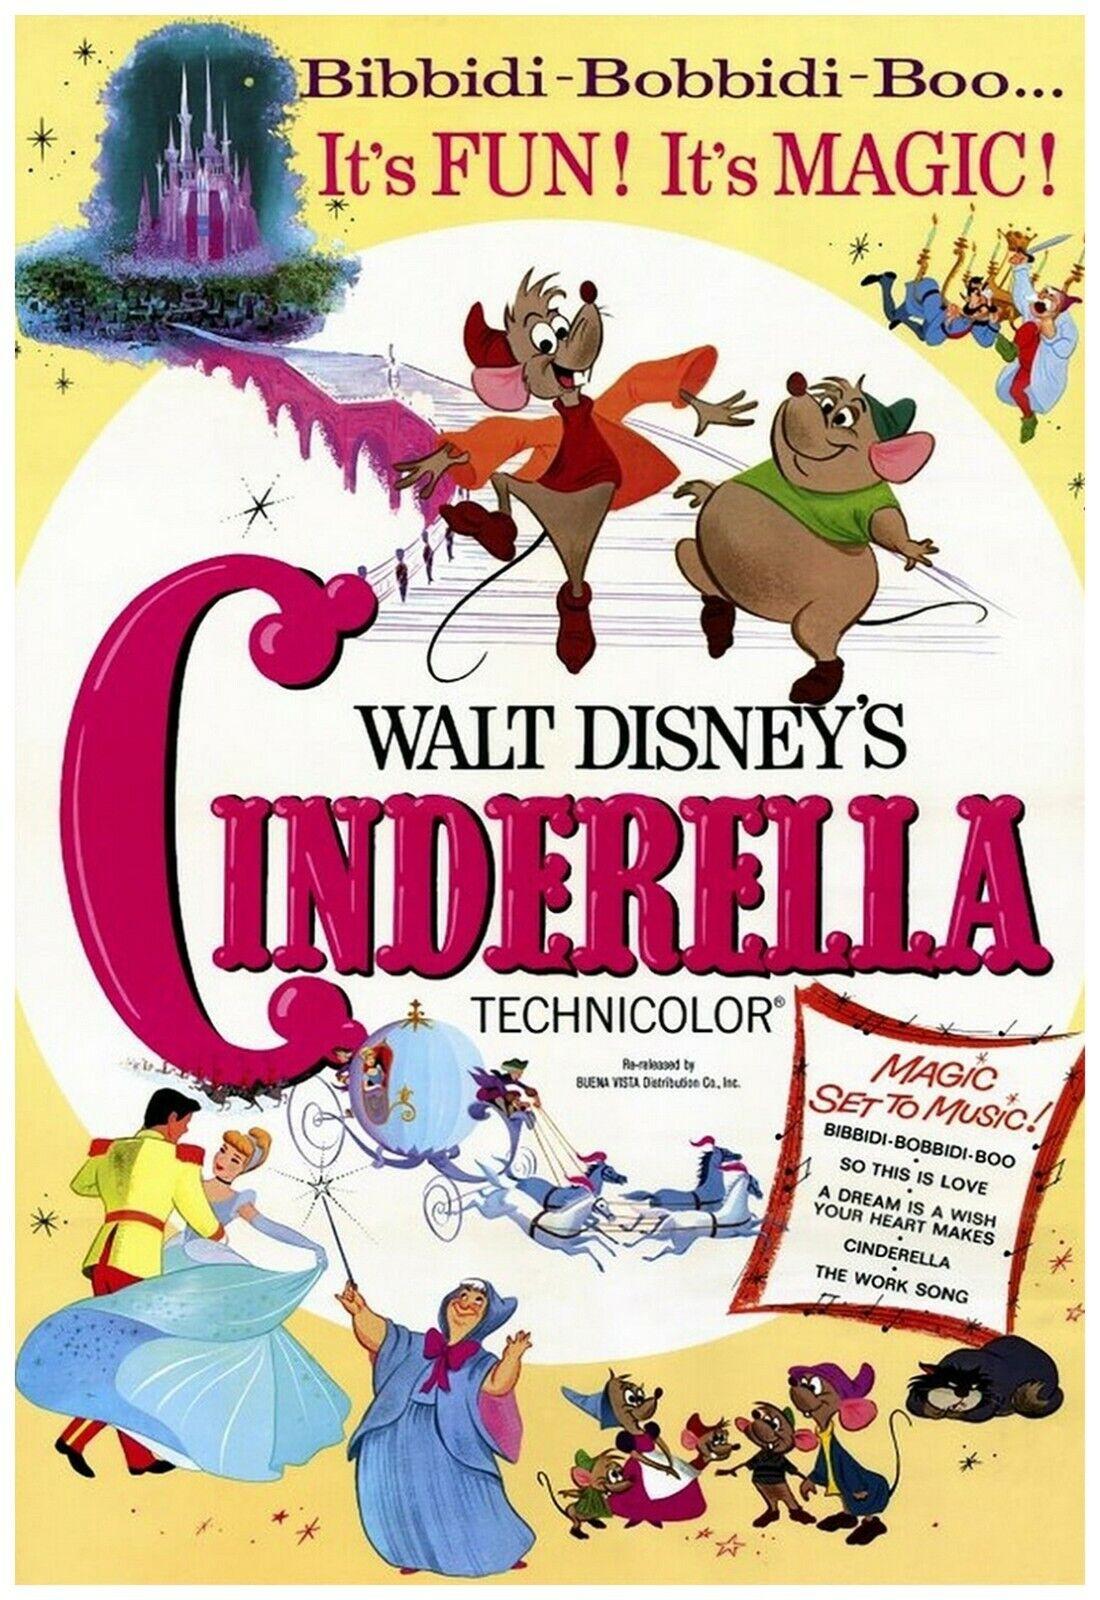 Cinderella Movie Poster 11x17 Inch Wall Art Portrait Print -